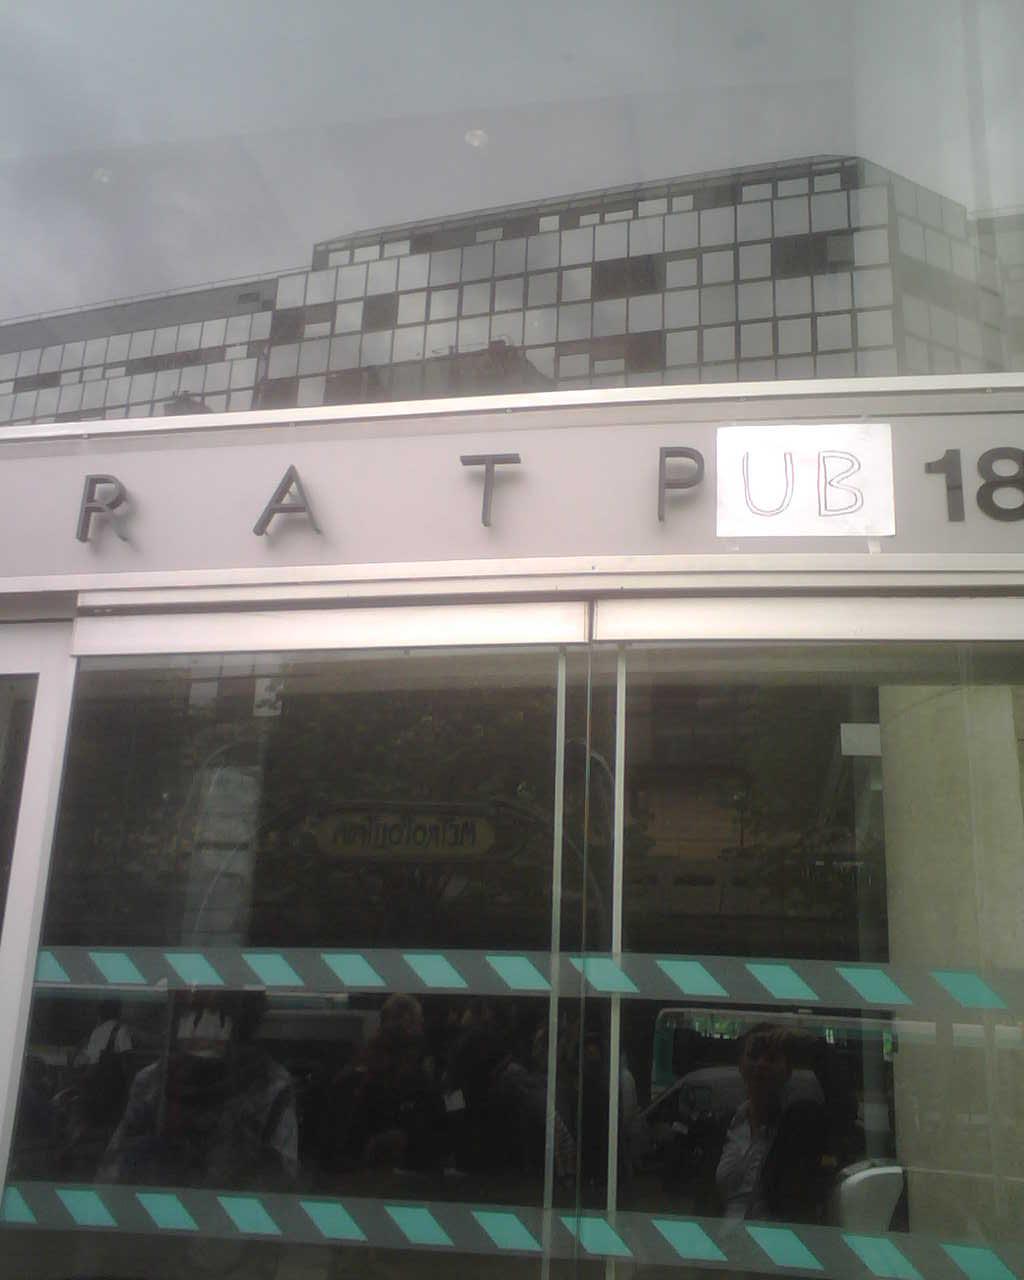 RATPUB-1